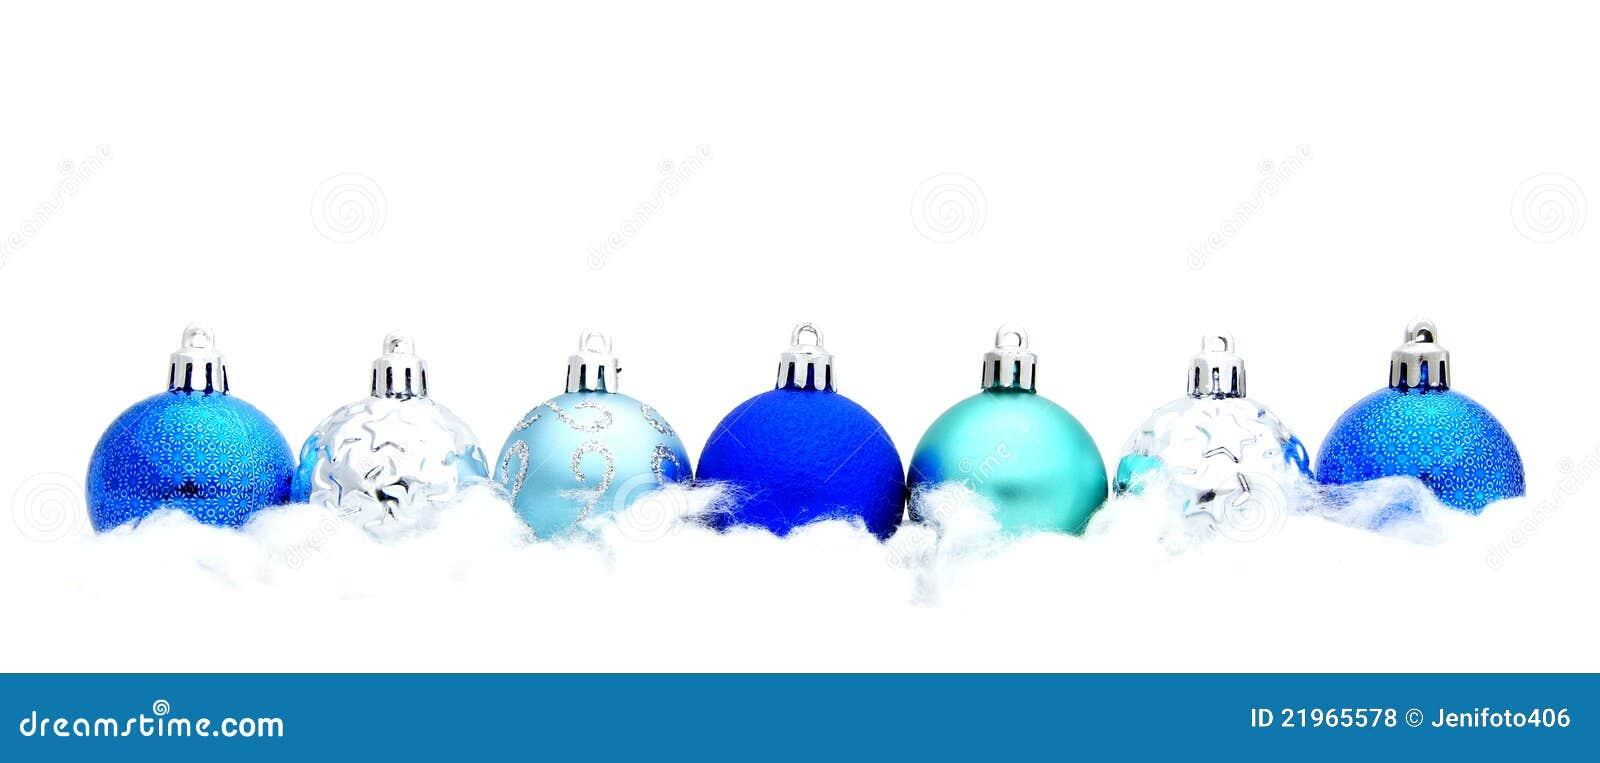 Blue Christmas Bauble Border Royalty Free Stock Photos